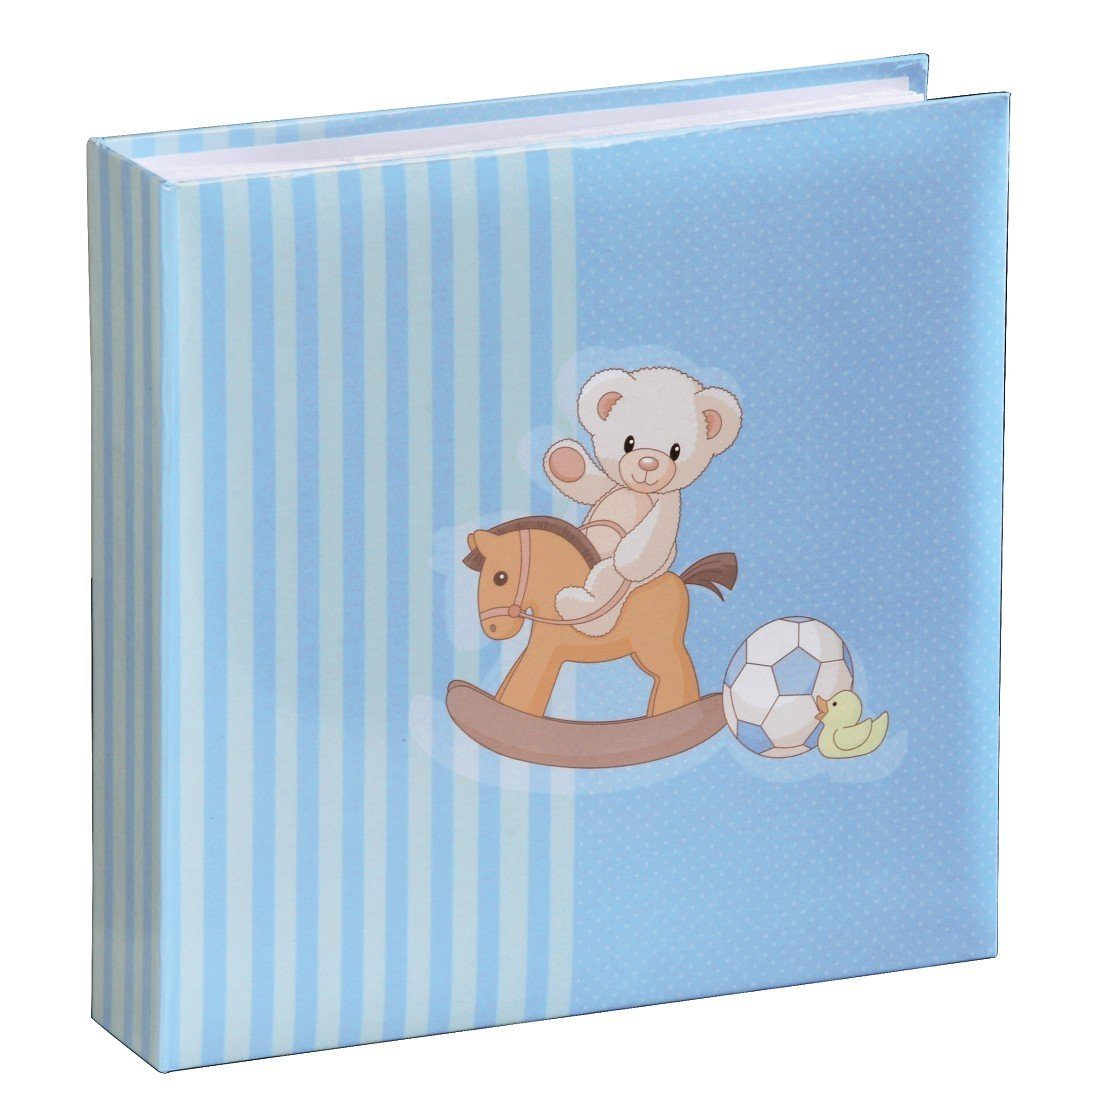 "Hama Babyalbum ""Joshua"", für 200 Fotos im Format 10x15 cm"